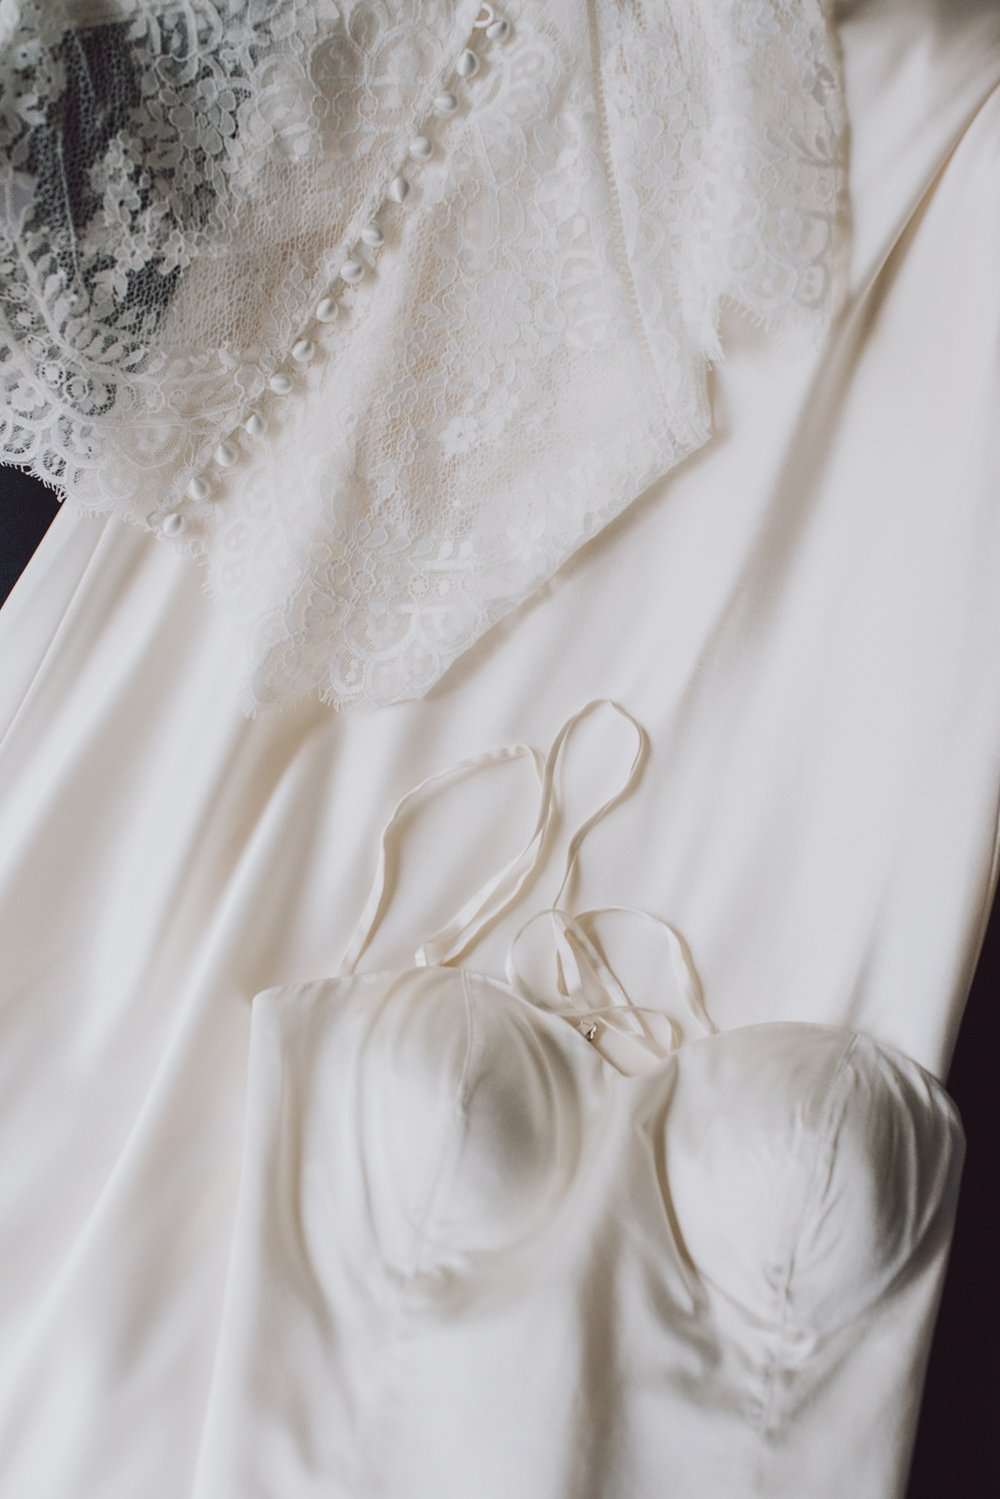 len_lynne_wedding_dress_edgartown-3681.jpg